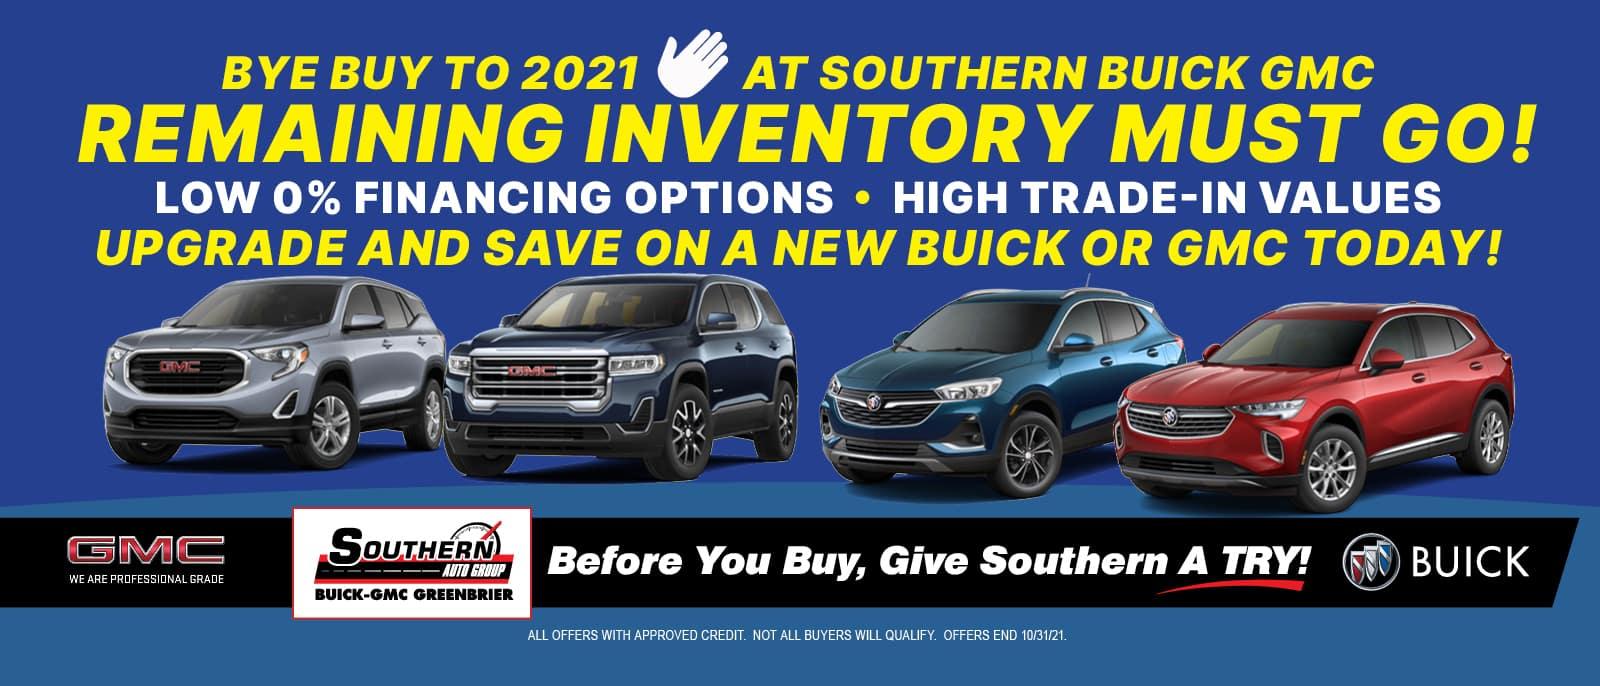 Greenbrier Buick GMC Bye Buy 2021